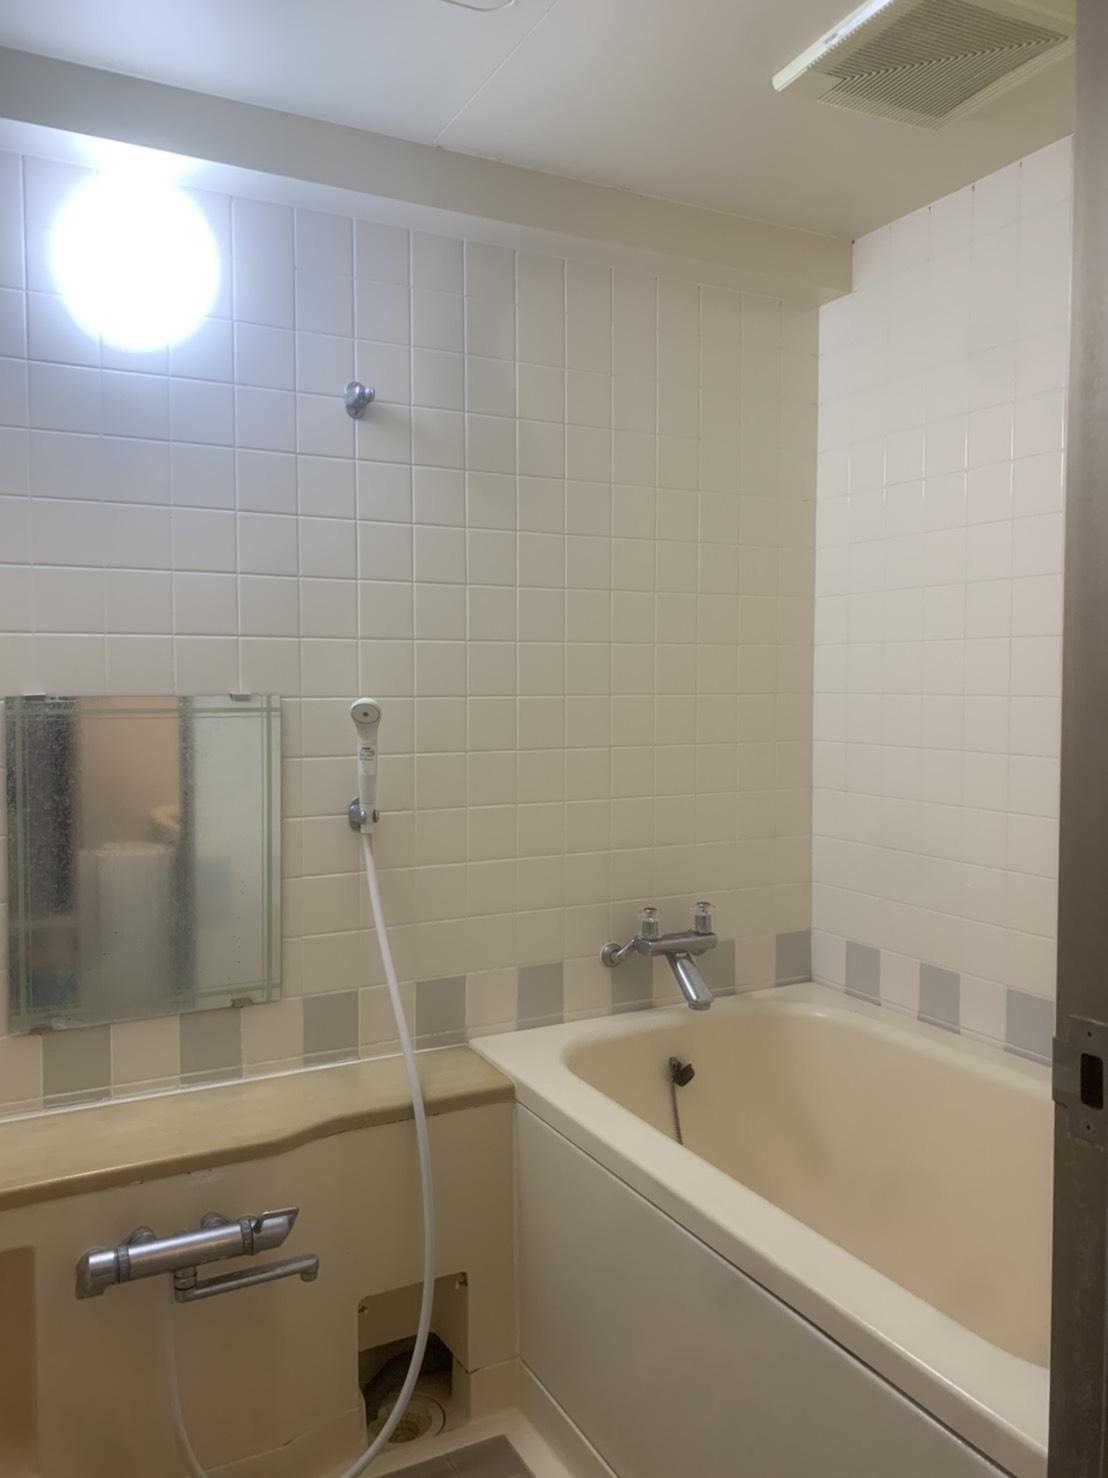 千葉 市川 バスルーム 施工事例